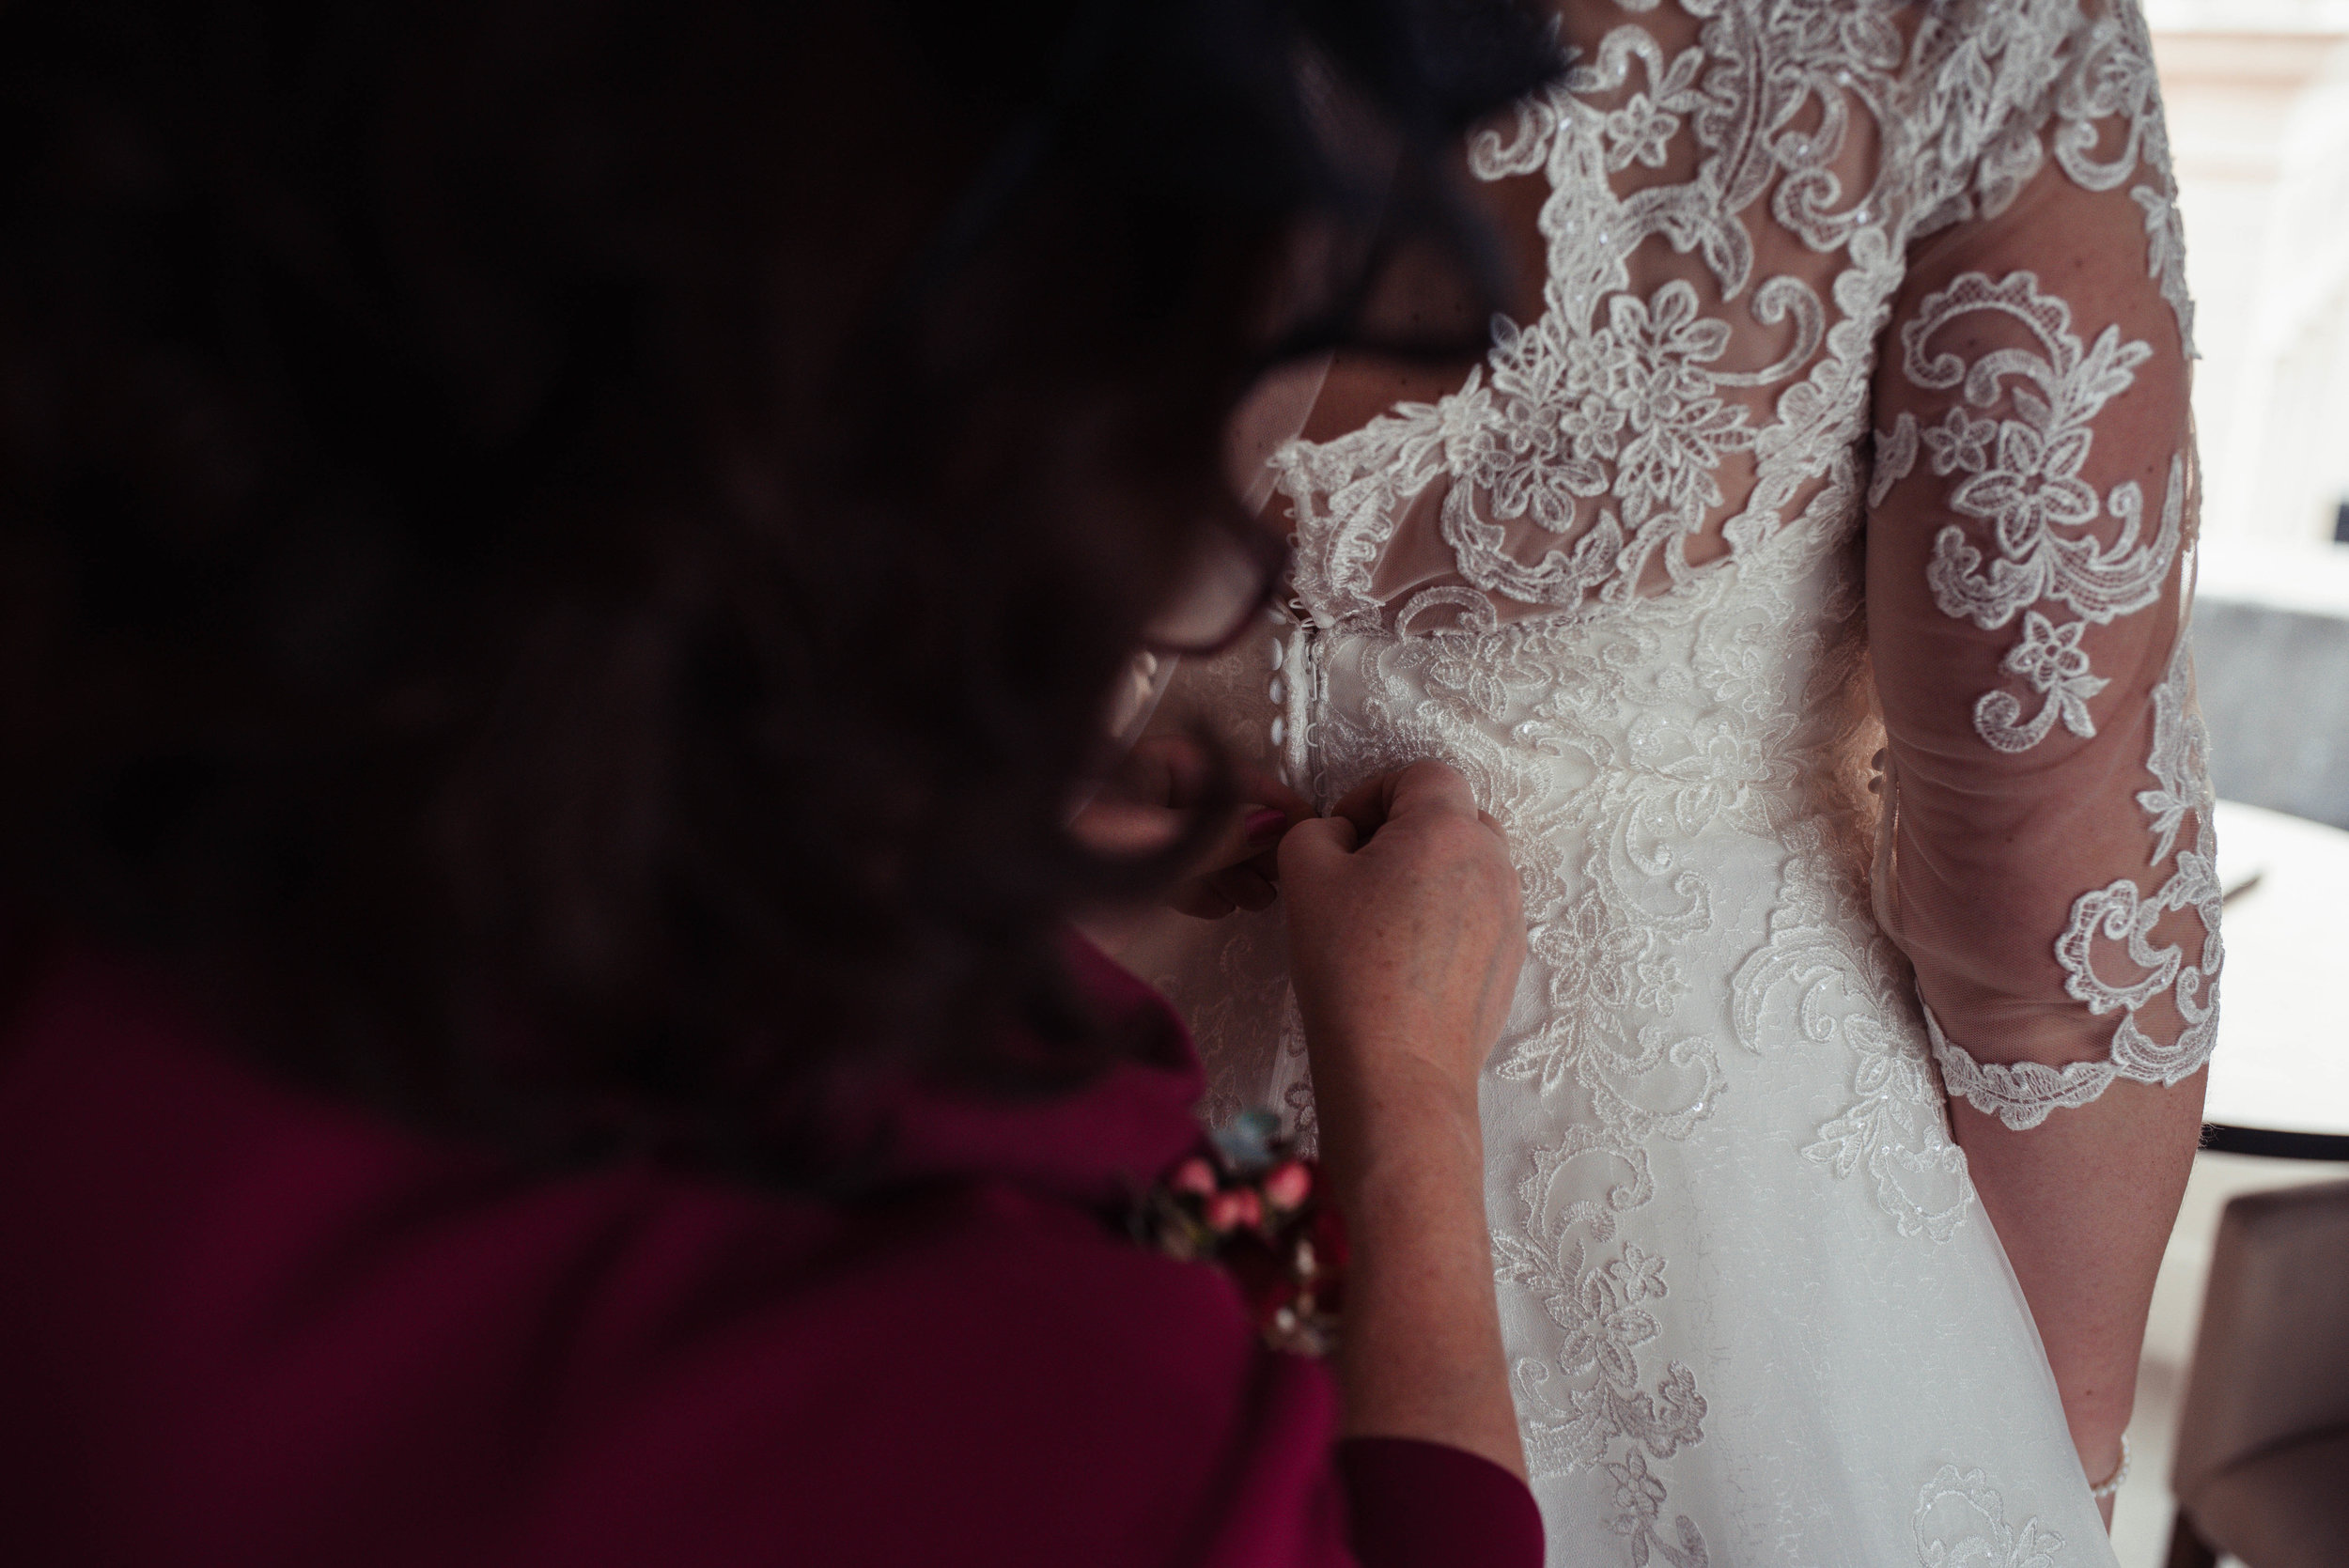 Belsfield-wedding-photography-11.jpg